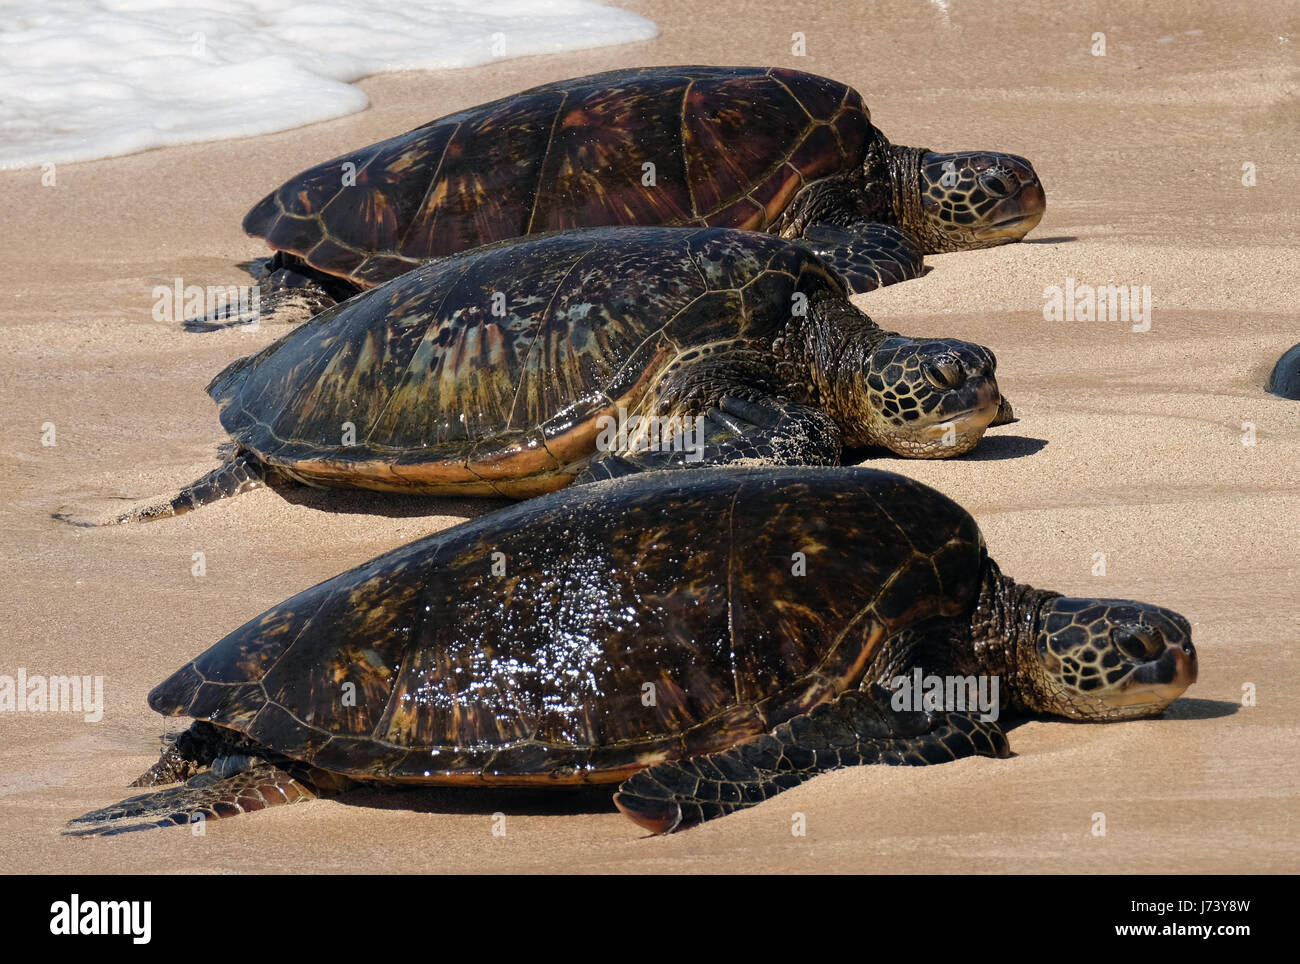 Green Sea Turtles (Chelonia mydas) resting on the beach at Ho'okipa Beach Park, Paia, Maui, Hawaii. - Stock Image